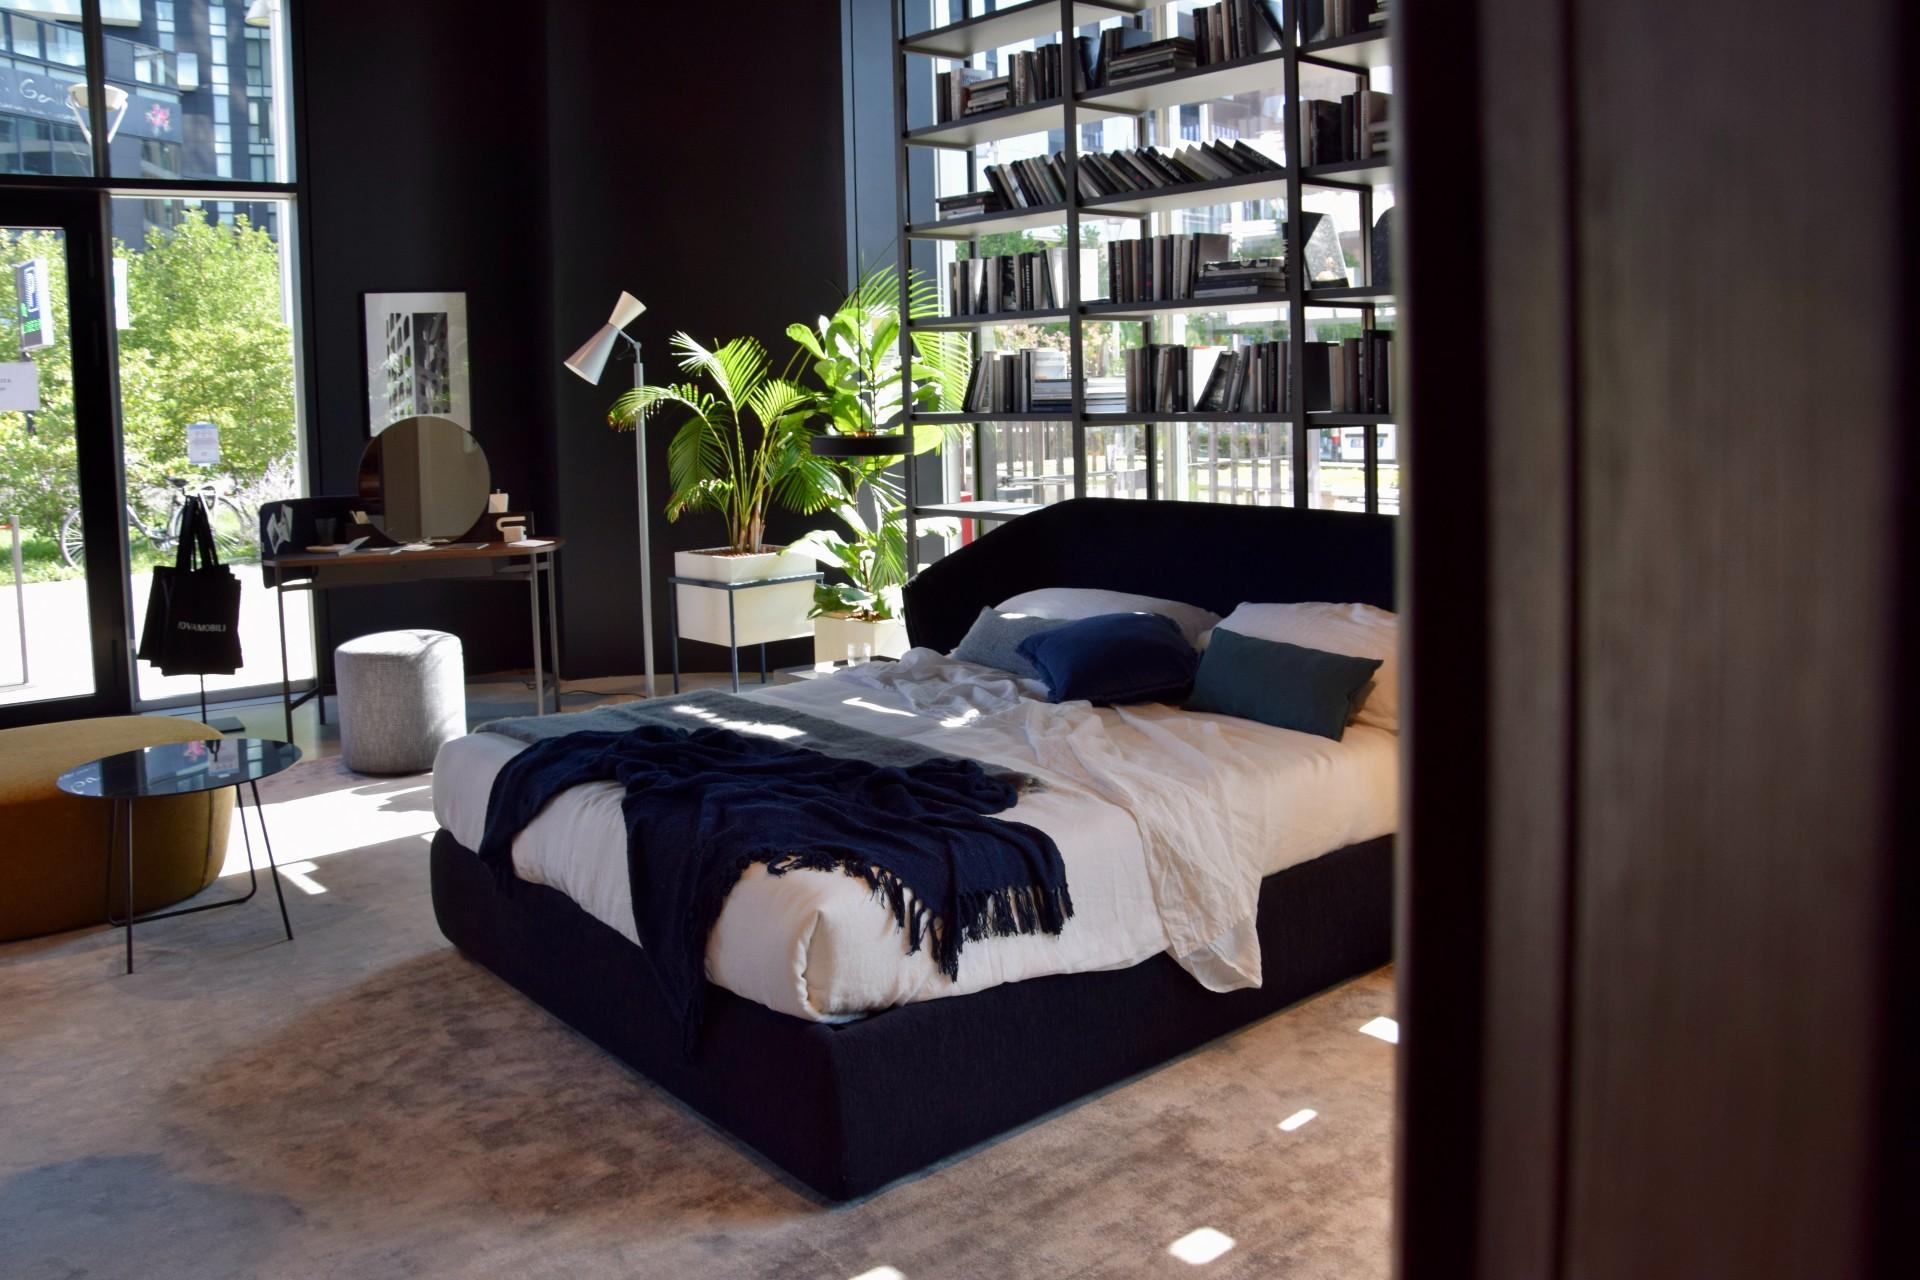 Hide bed by Novamobili